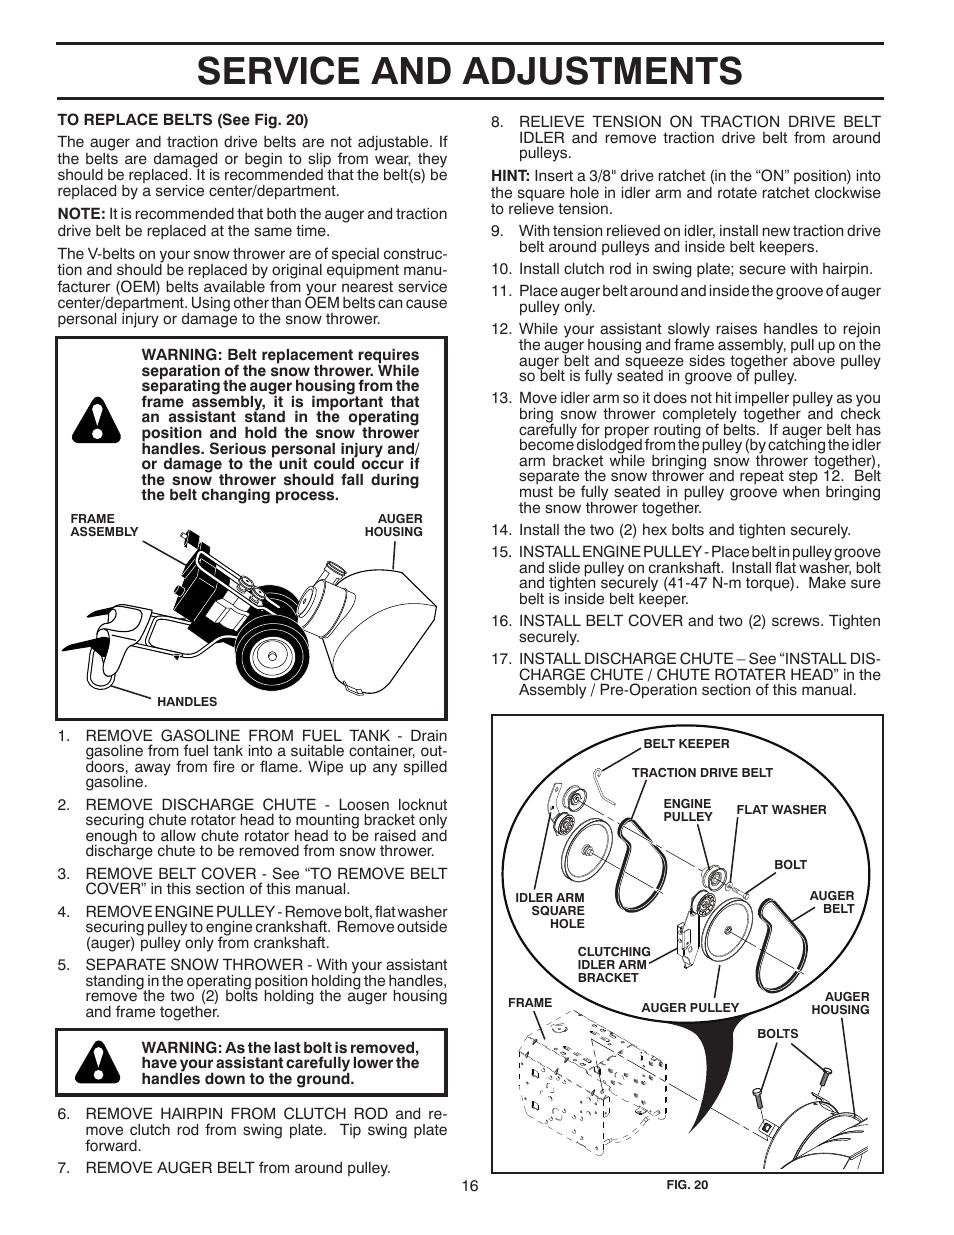 Poulan Engine Snow Thrower Parts Diagram Schematic Diagrams Chainsaw Wiring Pro Pr627es Model Diy Enthusiasts Blower List